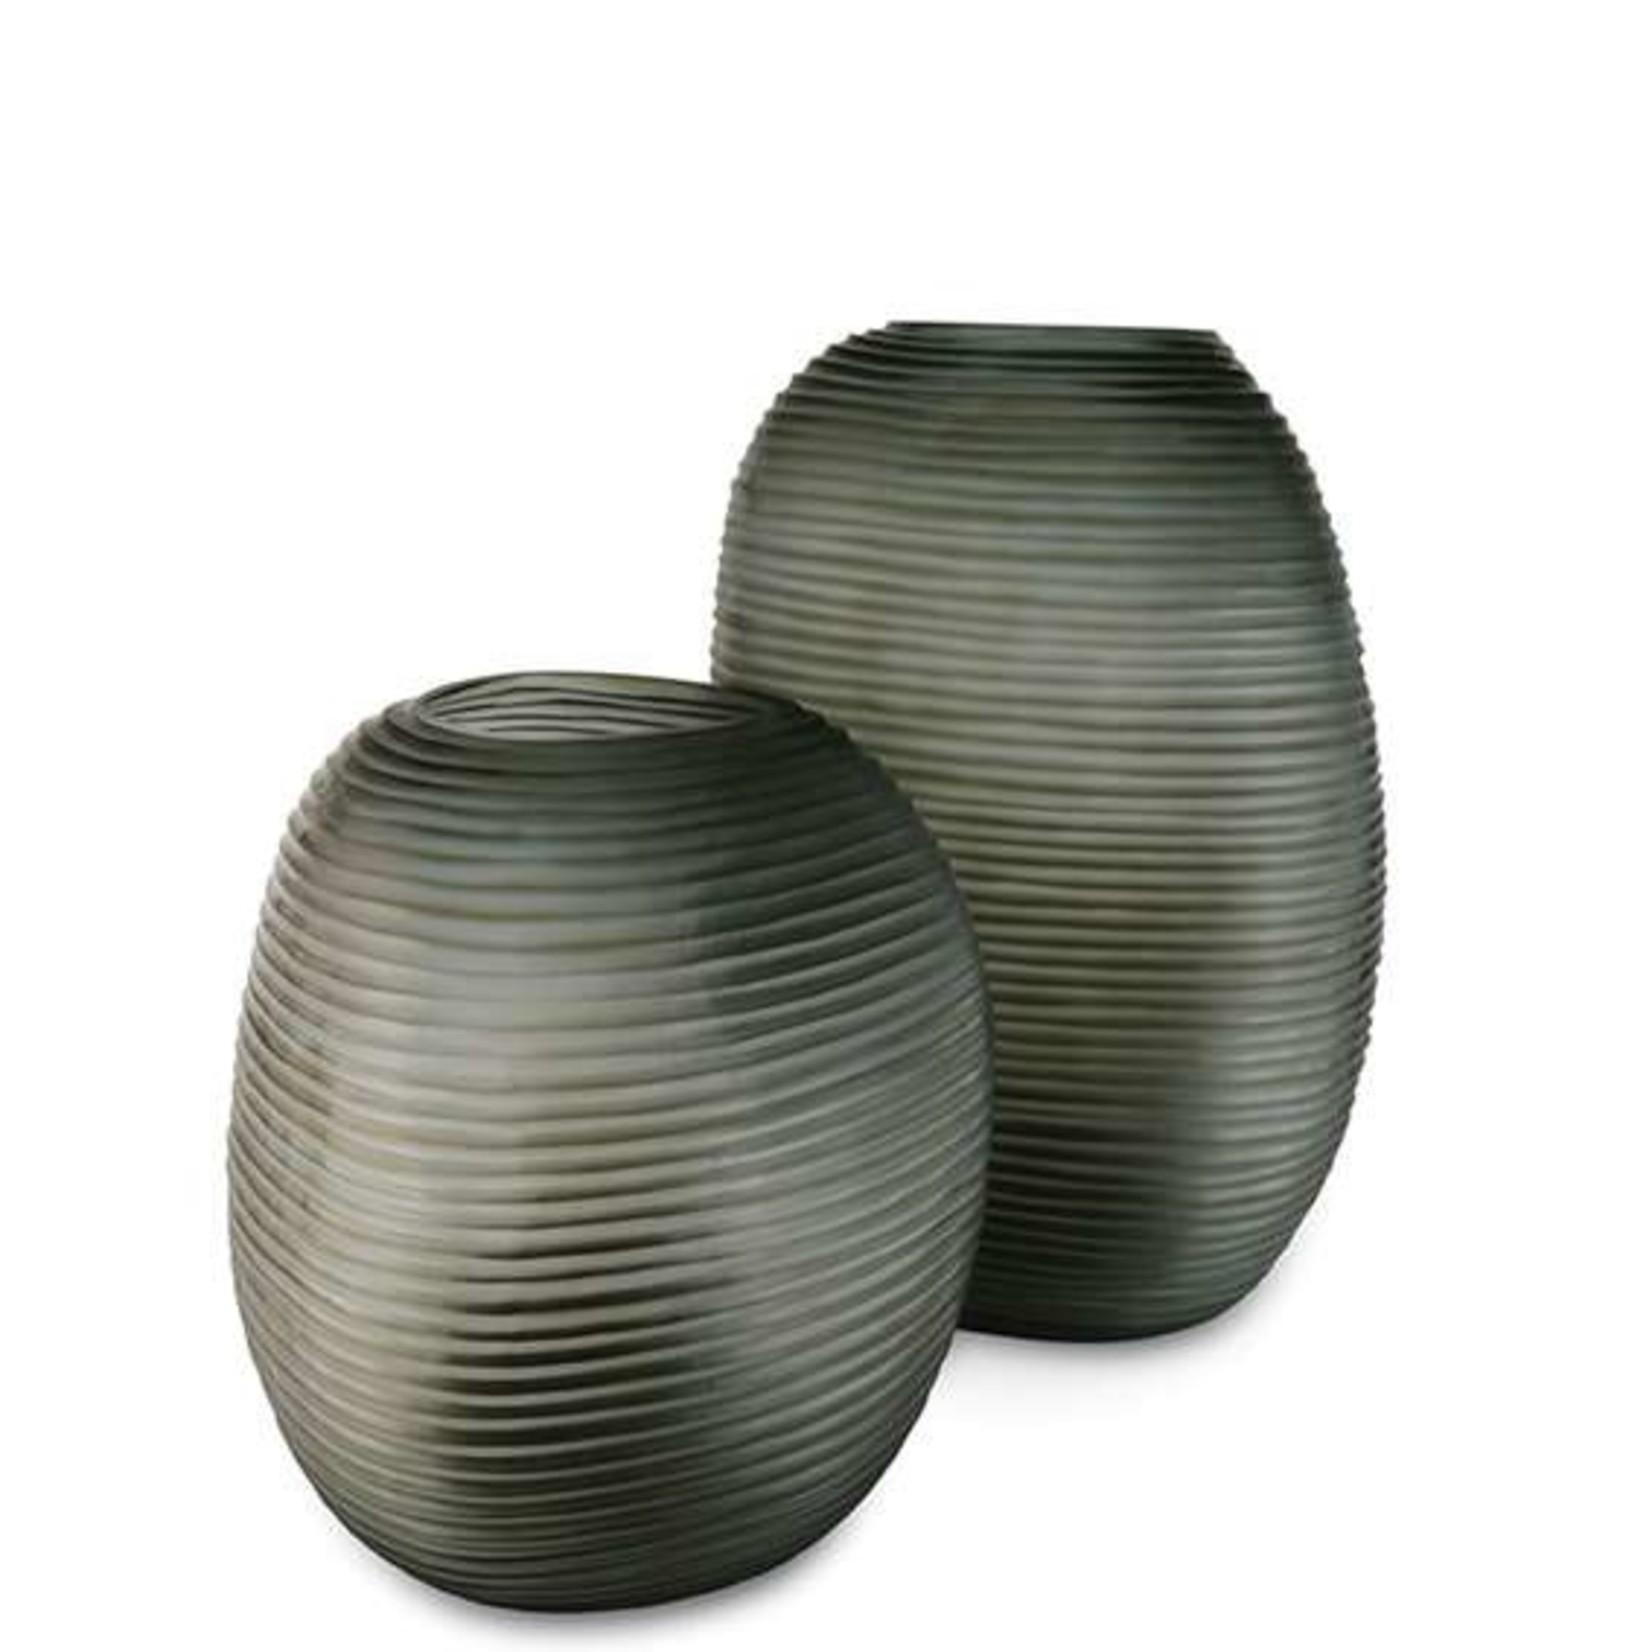 Guaxs Vase Patara Round | Indigo / Smoke Gray